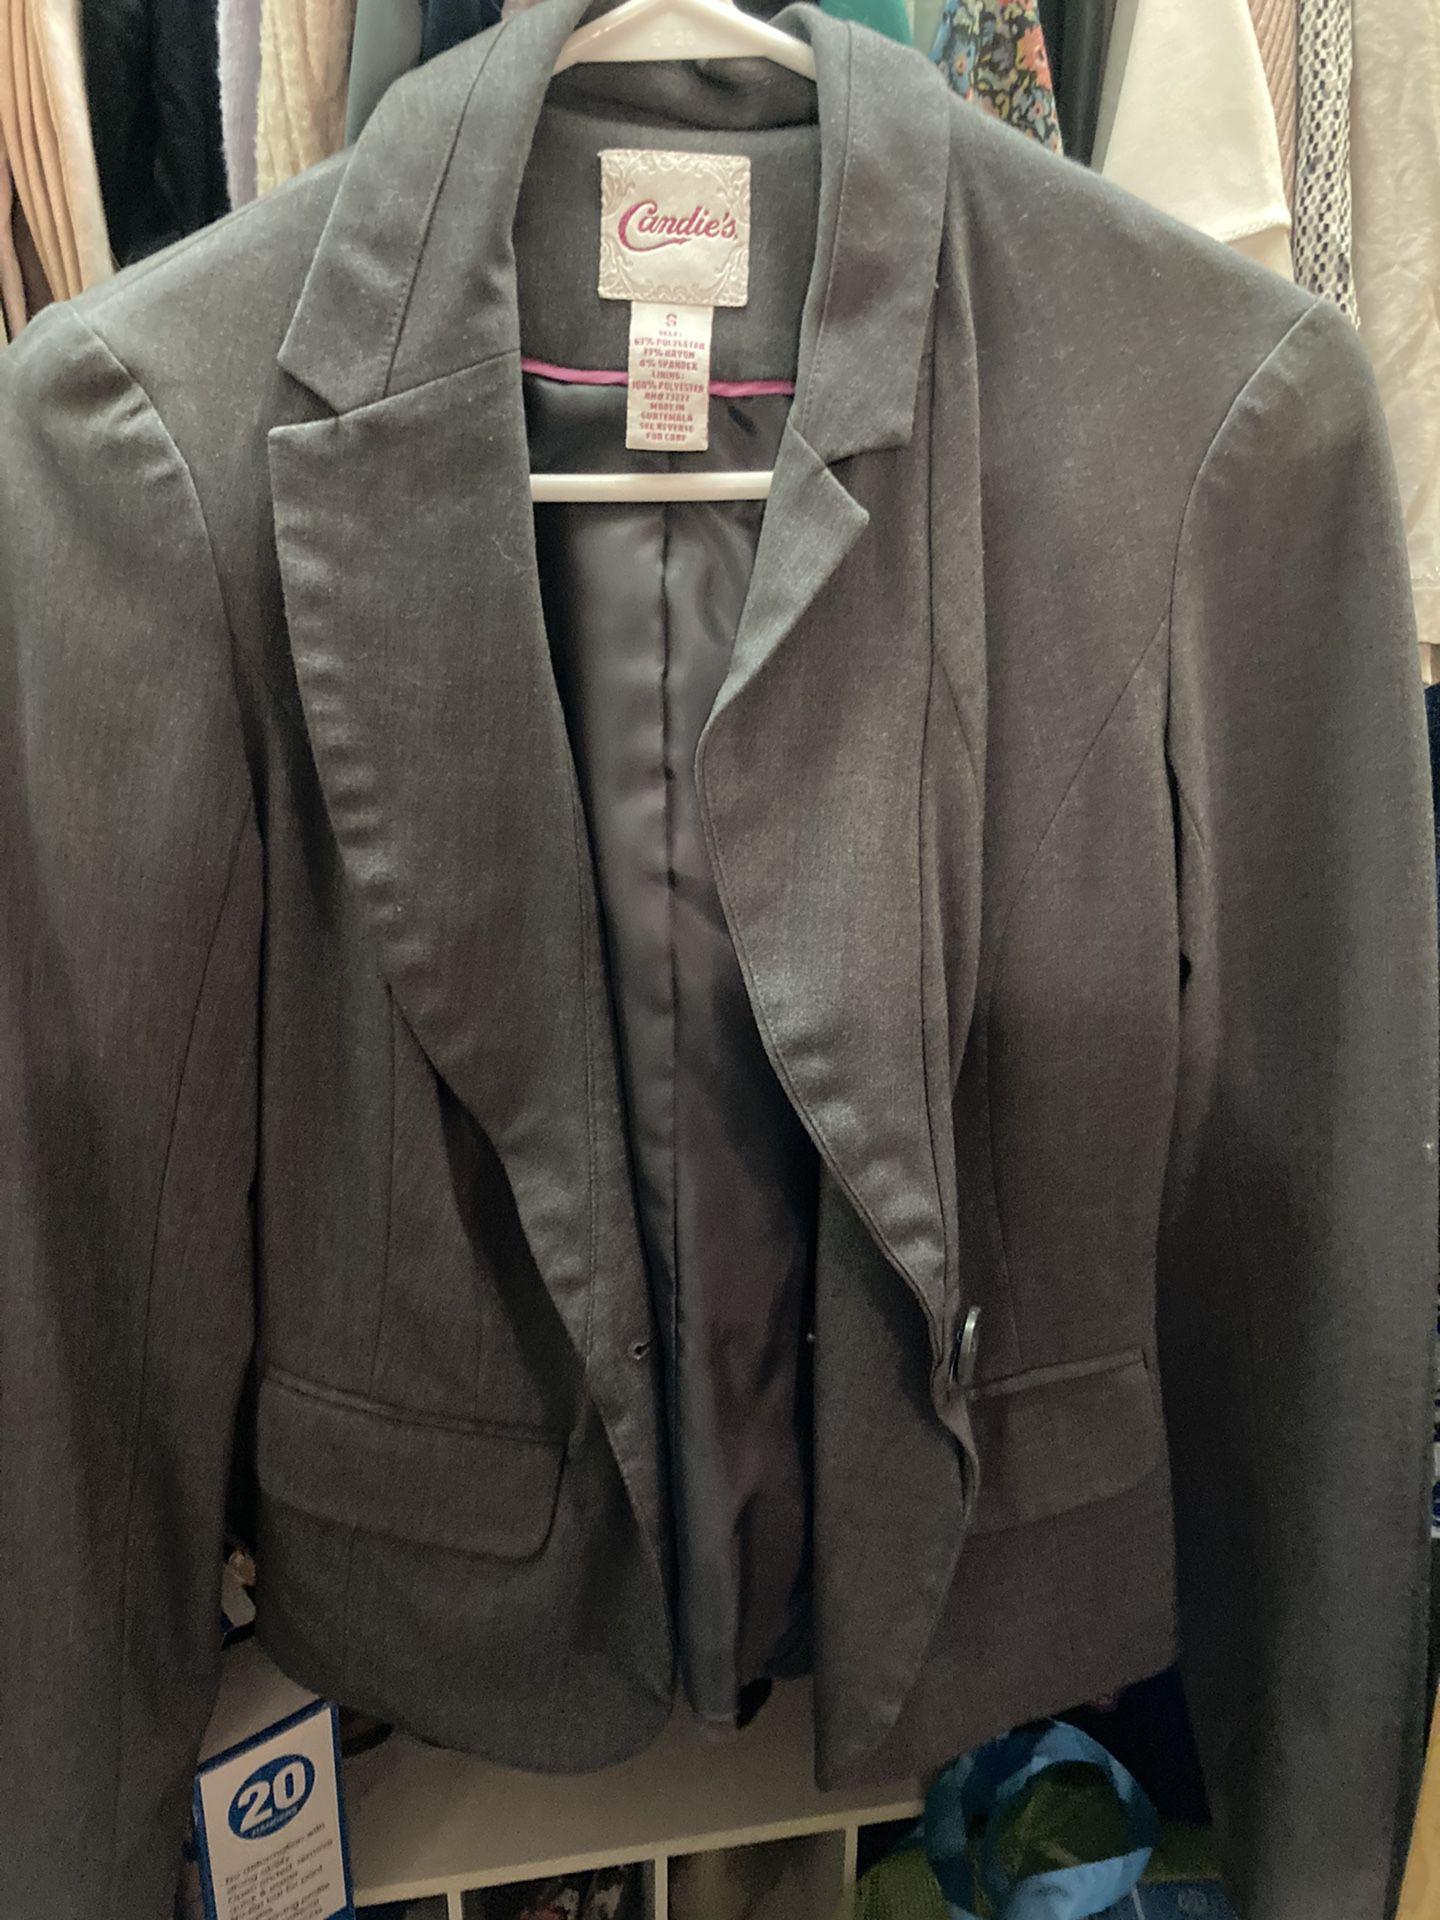 Sweatshirts, Suit Jackets, Size 12 AE Jeans, Rain Coat